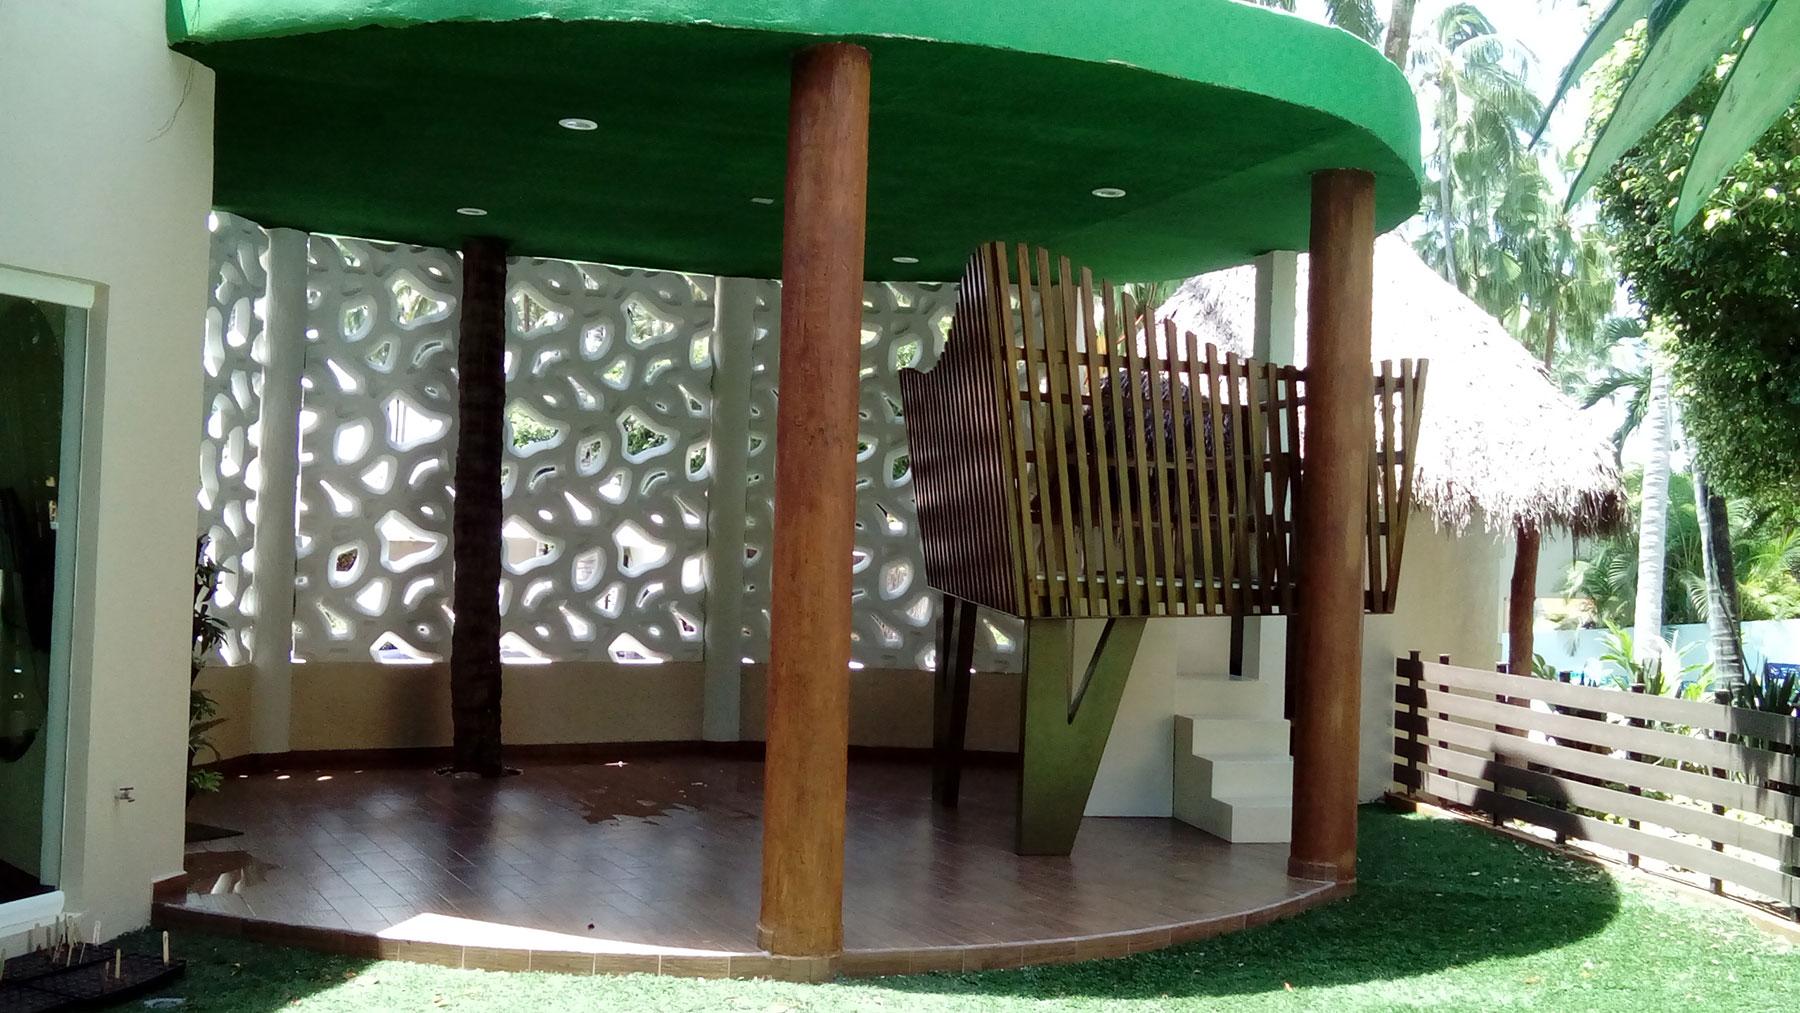 Proyectos SPAD Constructora, Westin Family Kids Club, Exterior jardín estructura de madera, Diseño de Interiores, Arquitectura, Puerto Vallarta, Jalisco, México